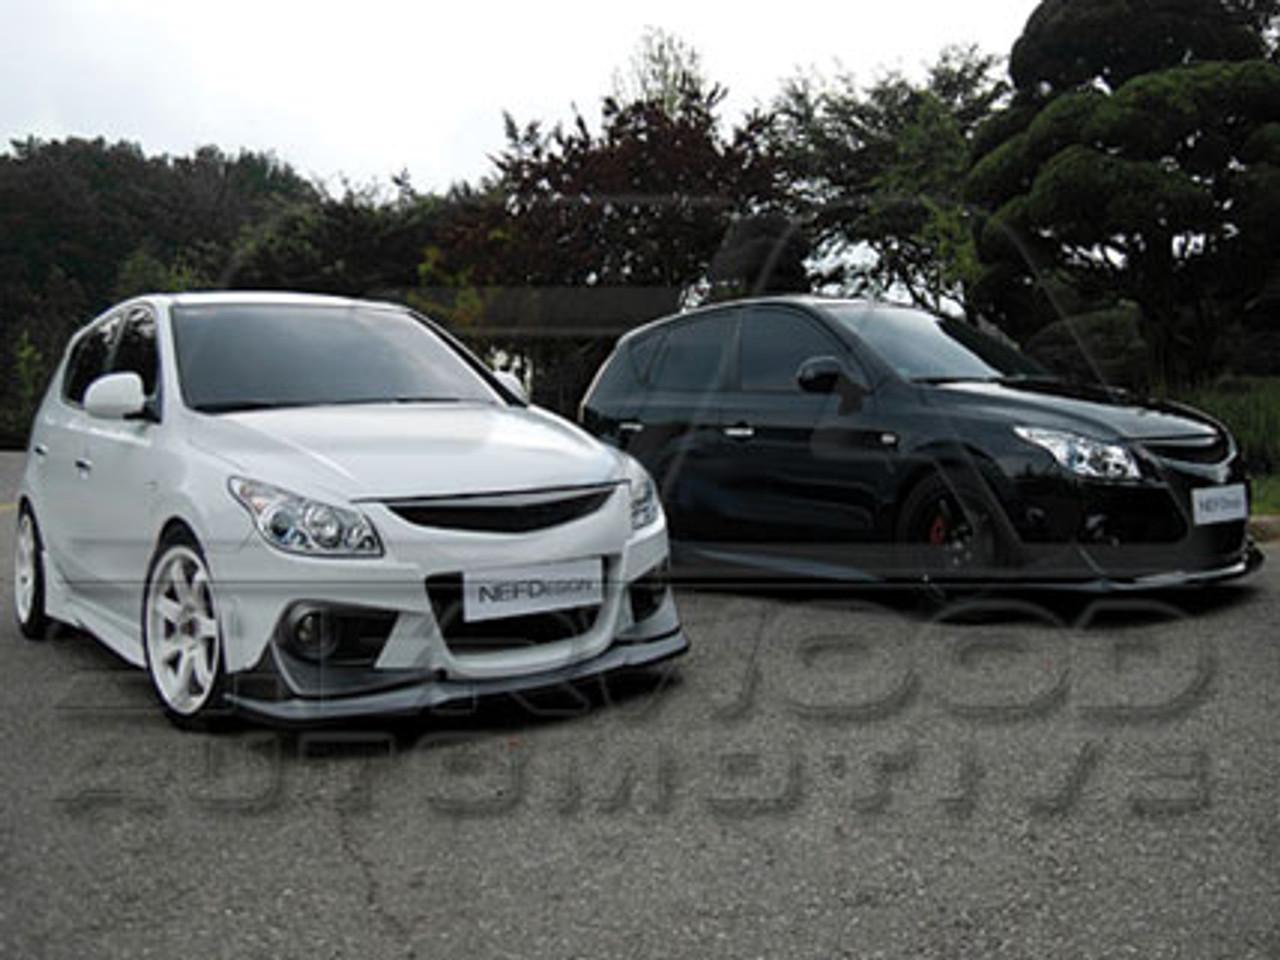 I30 Nefd Body Kit Korean Auto Imports